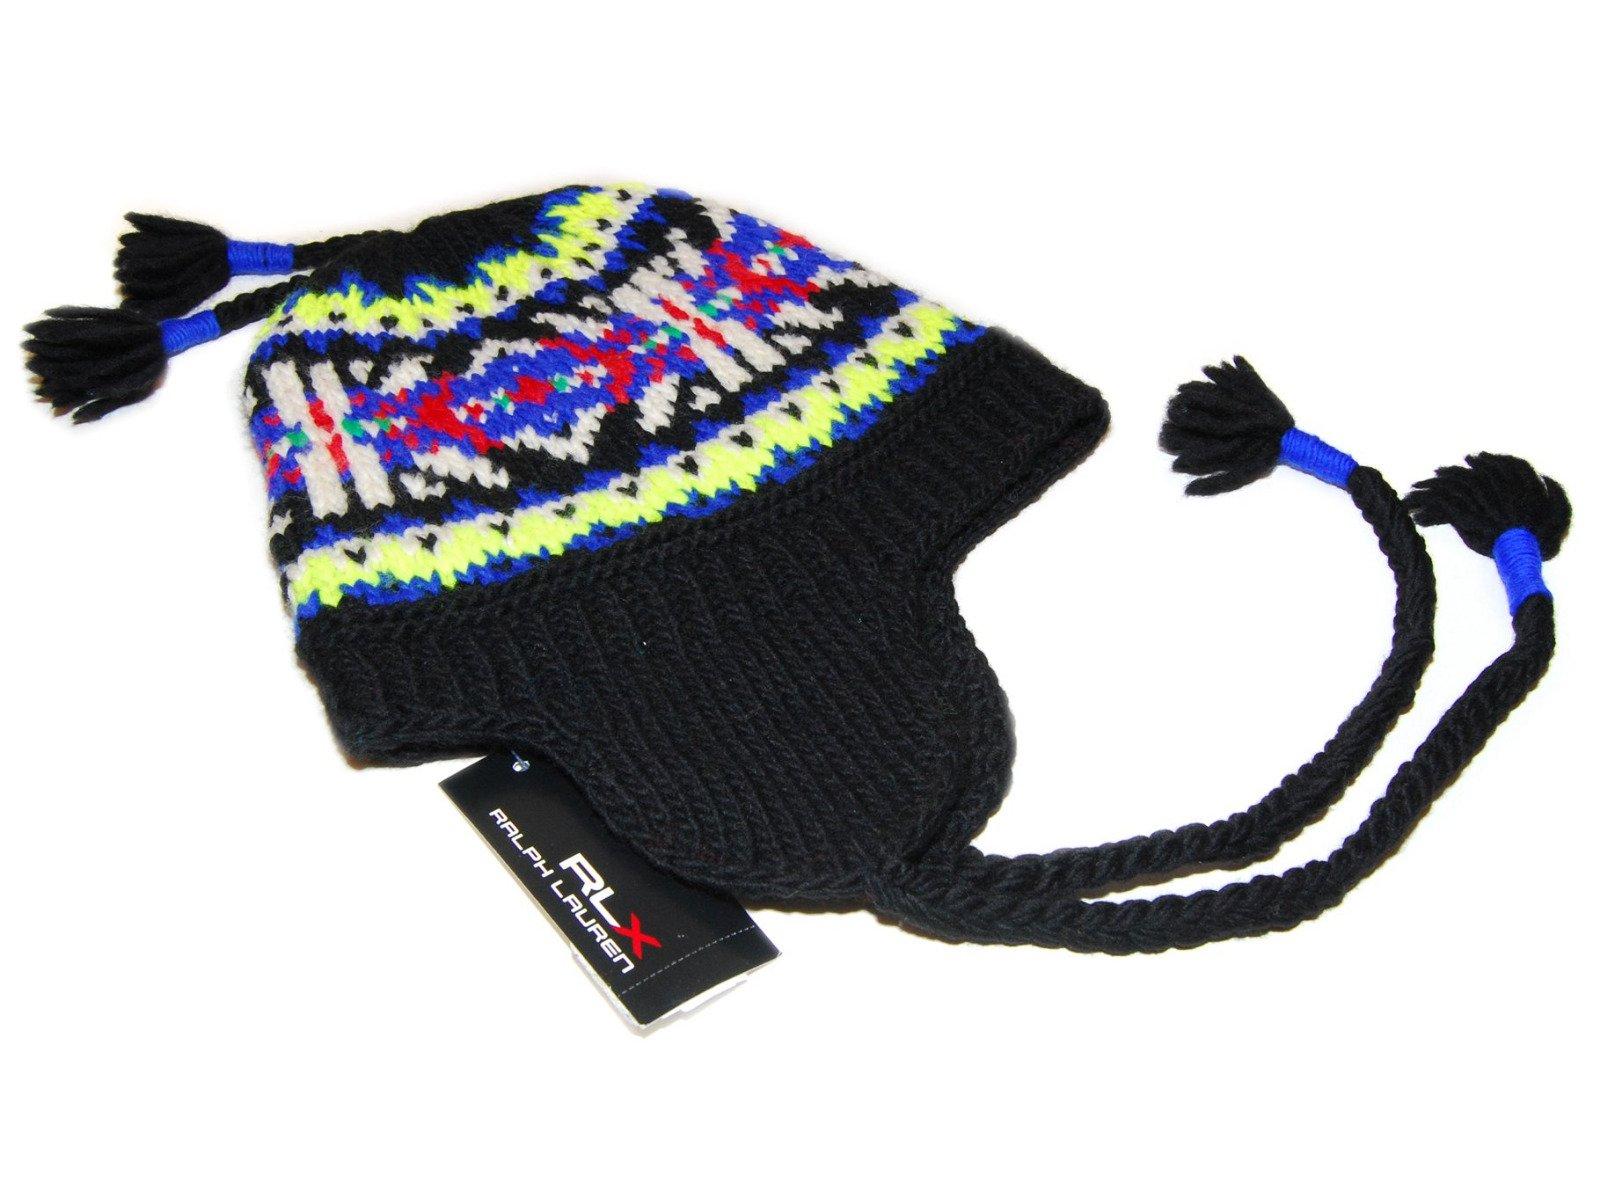 Ralph Lauren RLX Mens Womens Wool Ski Skull Knit Hat Cap Black Yellow Blue Red